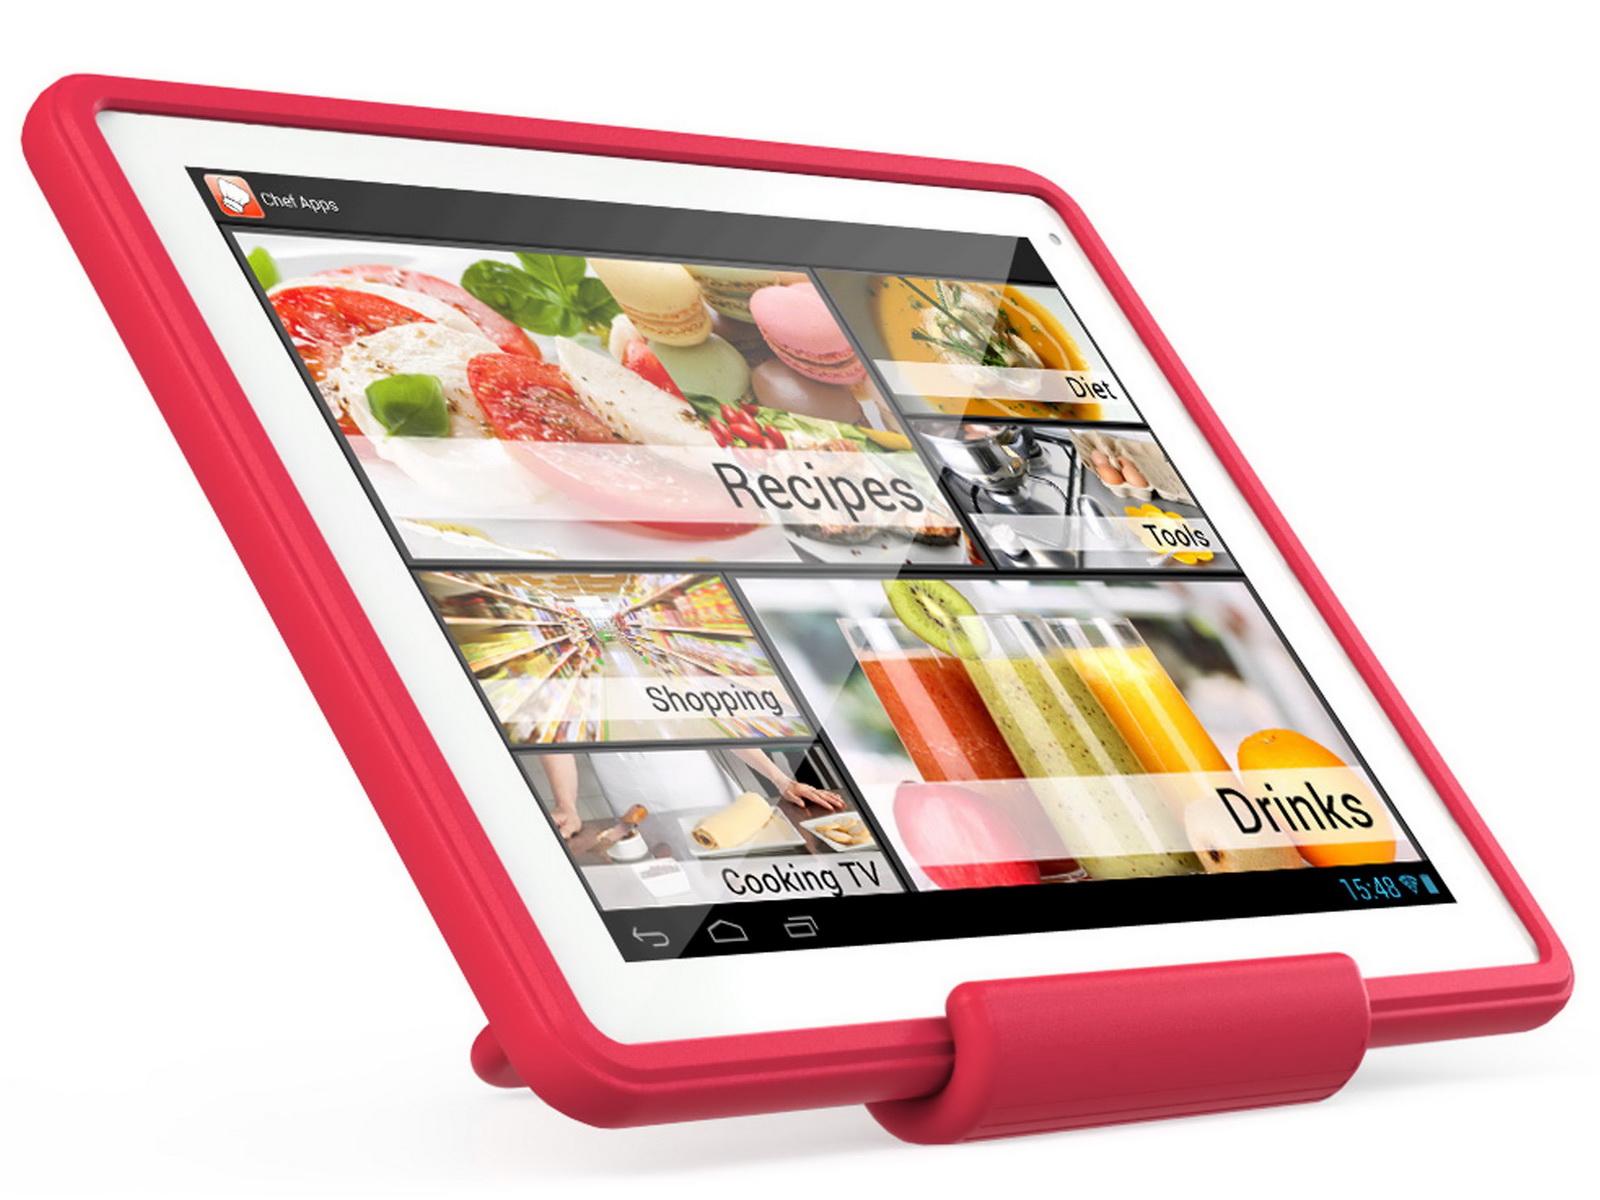 Archos: 9,7-Zoll-Tablet ChefPad für Hobby-Köche ...